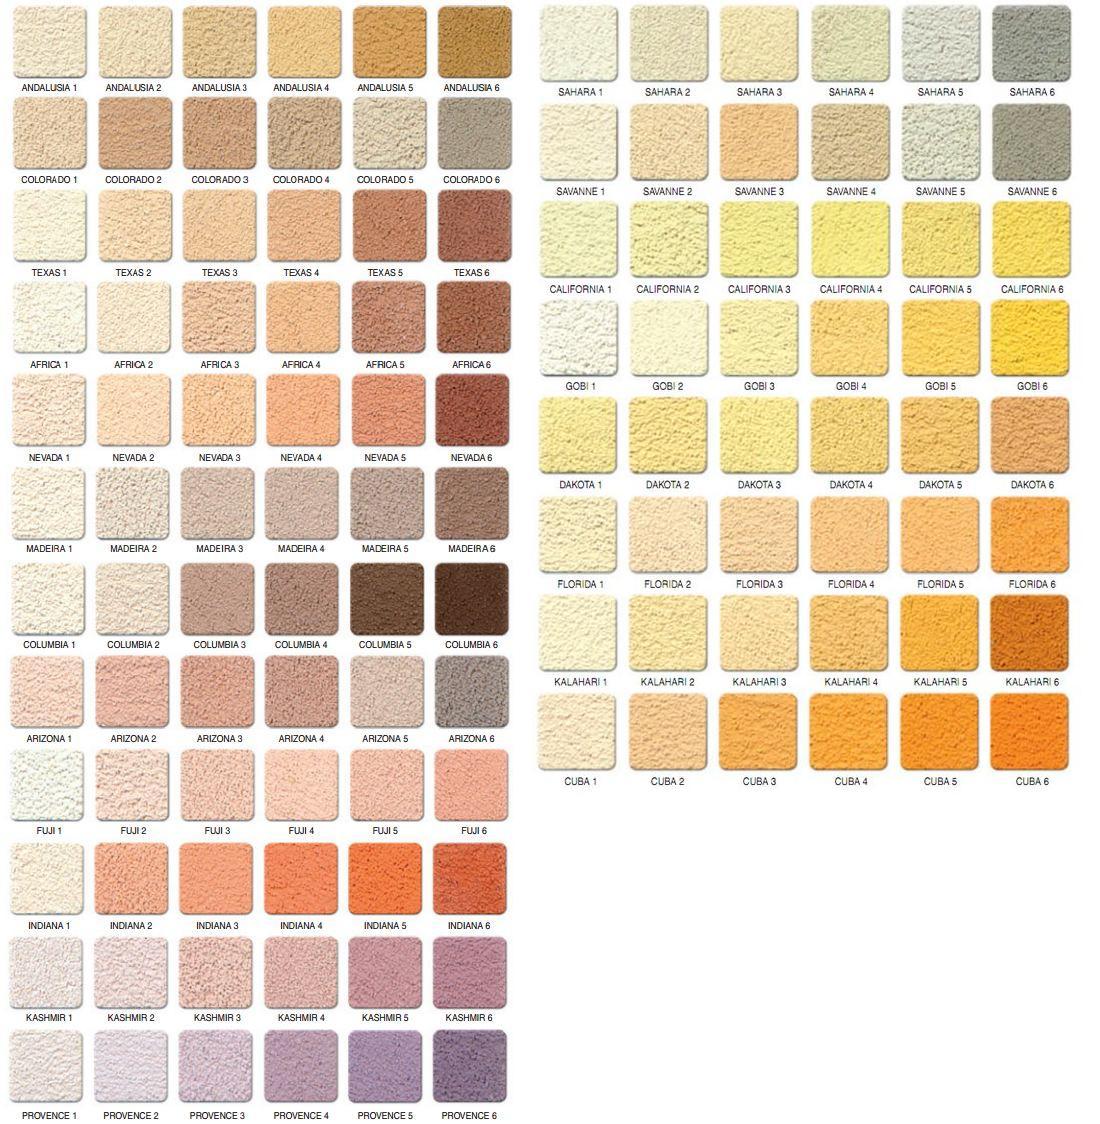 Imagini Tencuiala Decorativa Exterior.Culori Si Paletare Tencuiala Decorativa Misiunea Casa